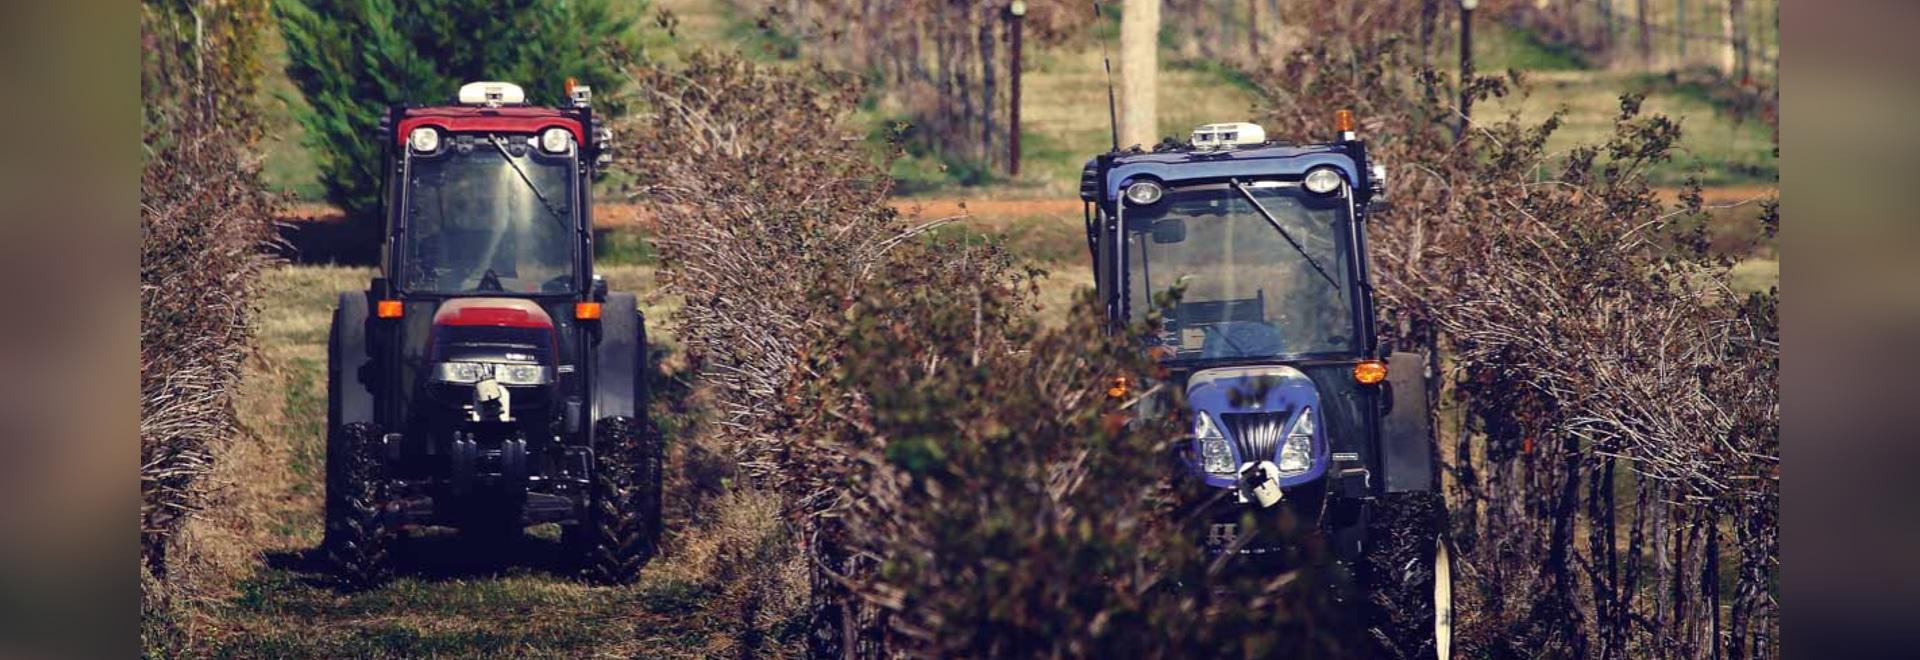 Orchard & Vineyard Coverage